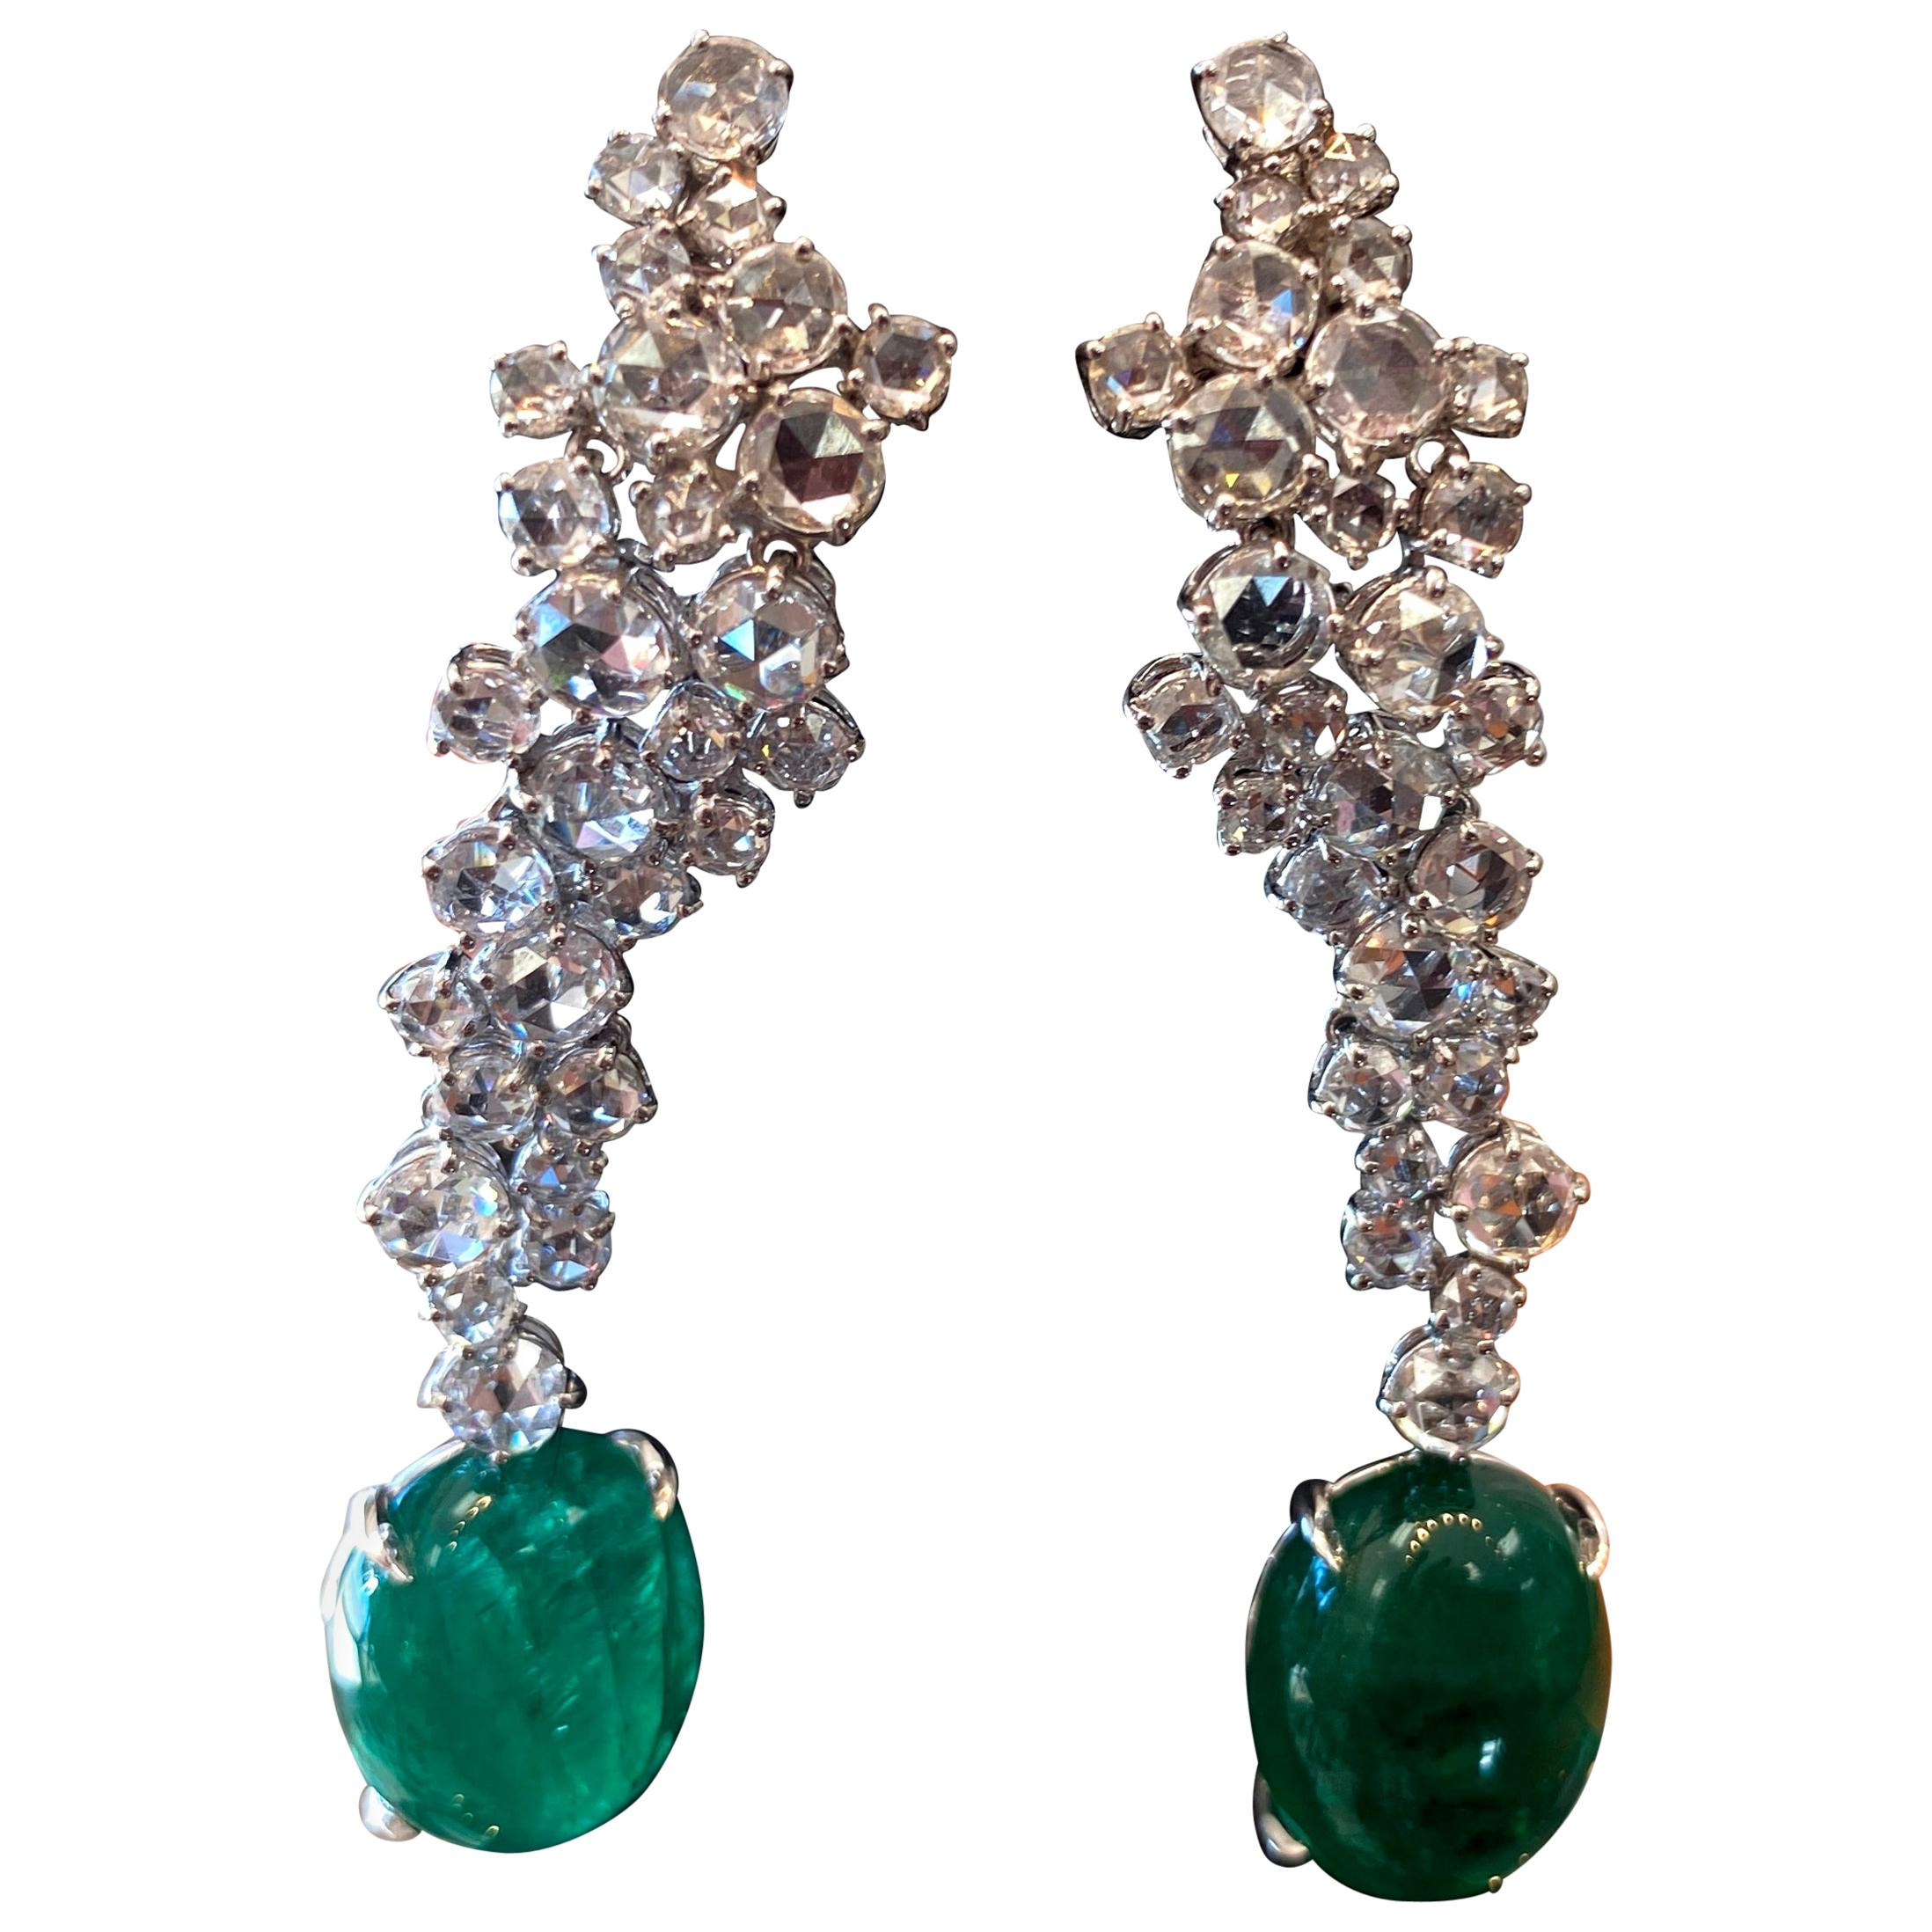 18 Karat White Gold Diamond and Emerald Drop Earrings